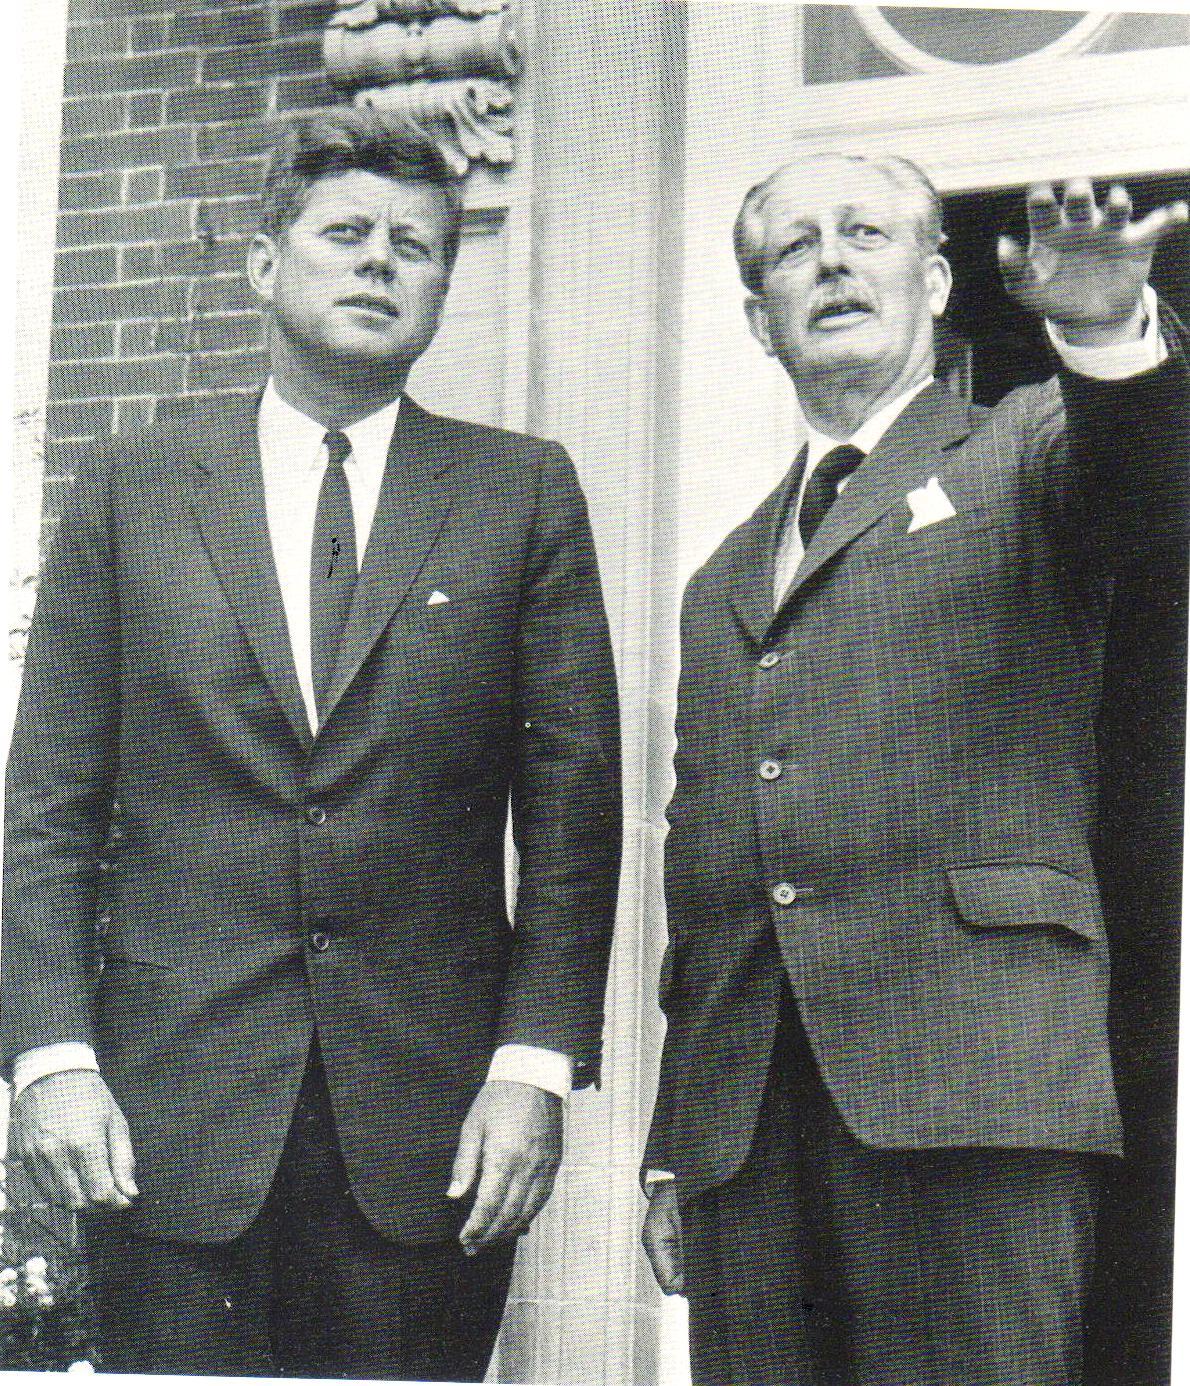 President Kennedy visits Premier Harold Macmillan's home in Horsted Keynes June 1963